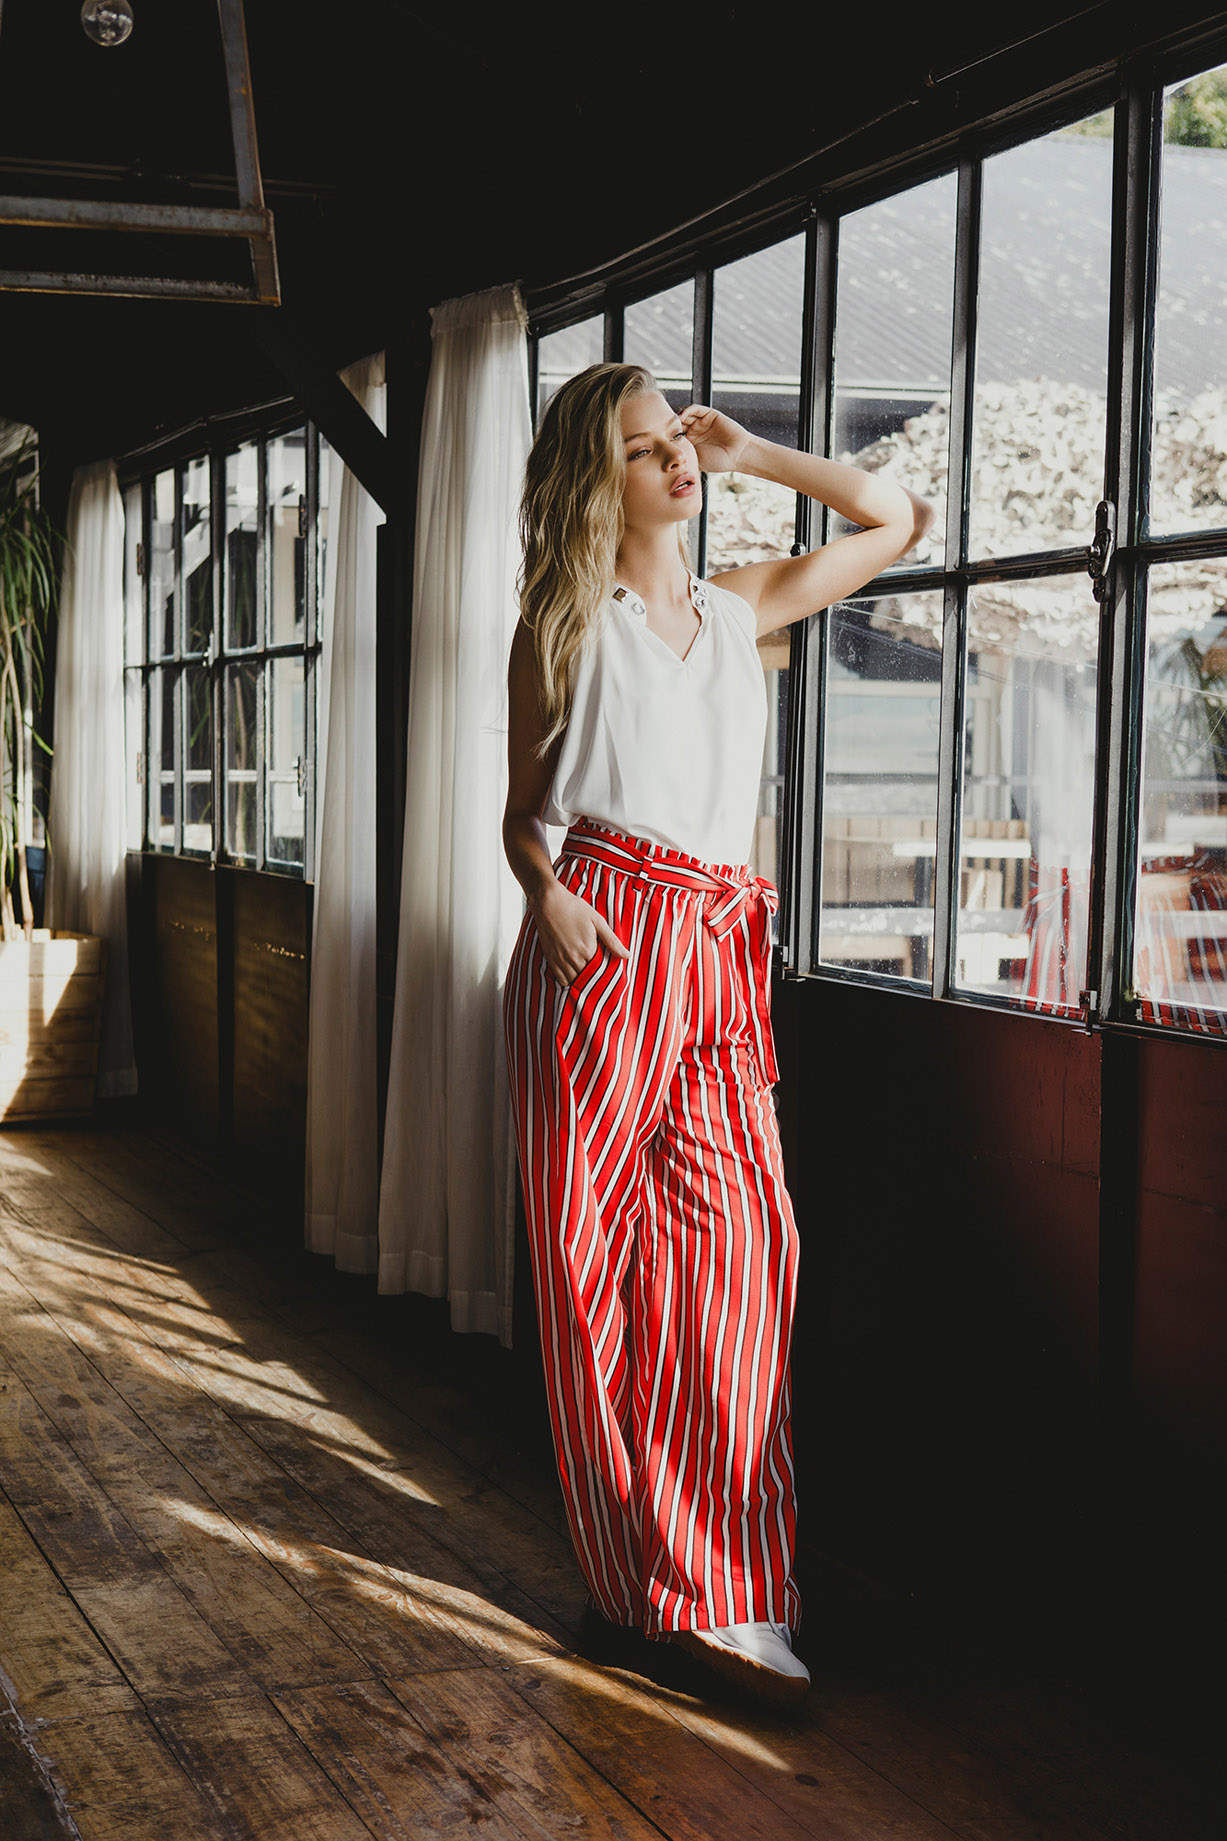 Модная одежда Aisuru, весна-лето 2019 / Floren Baldi by Cecilia Romano